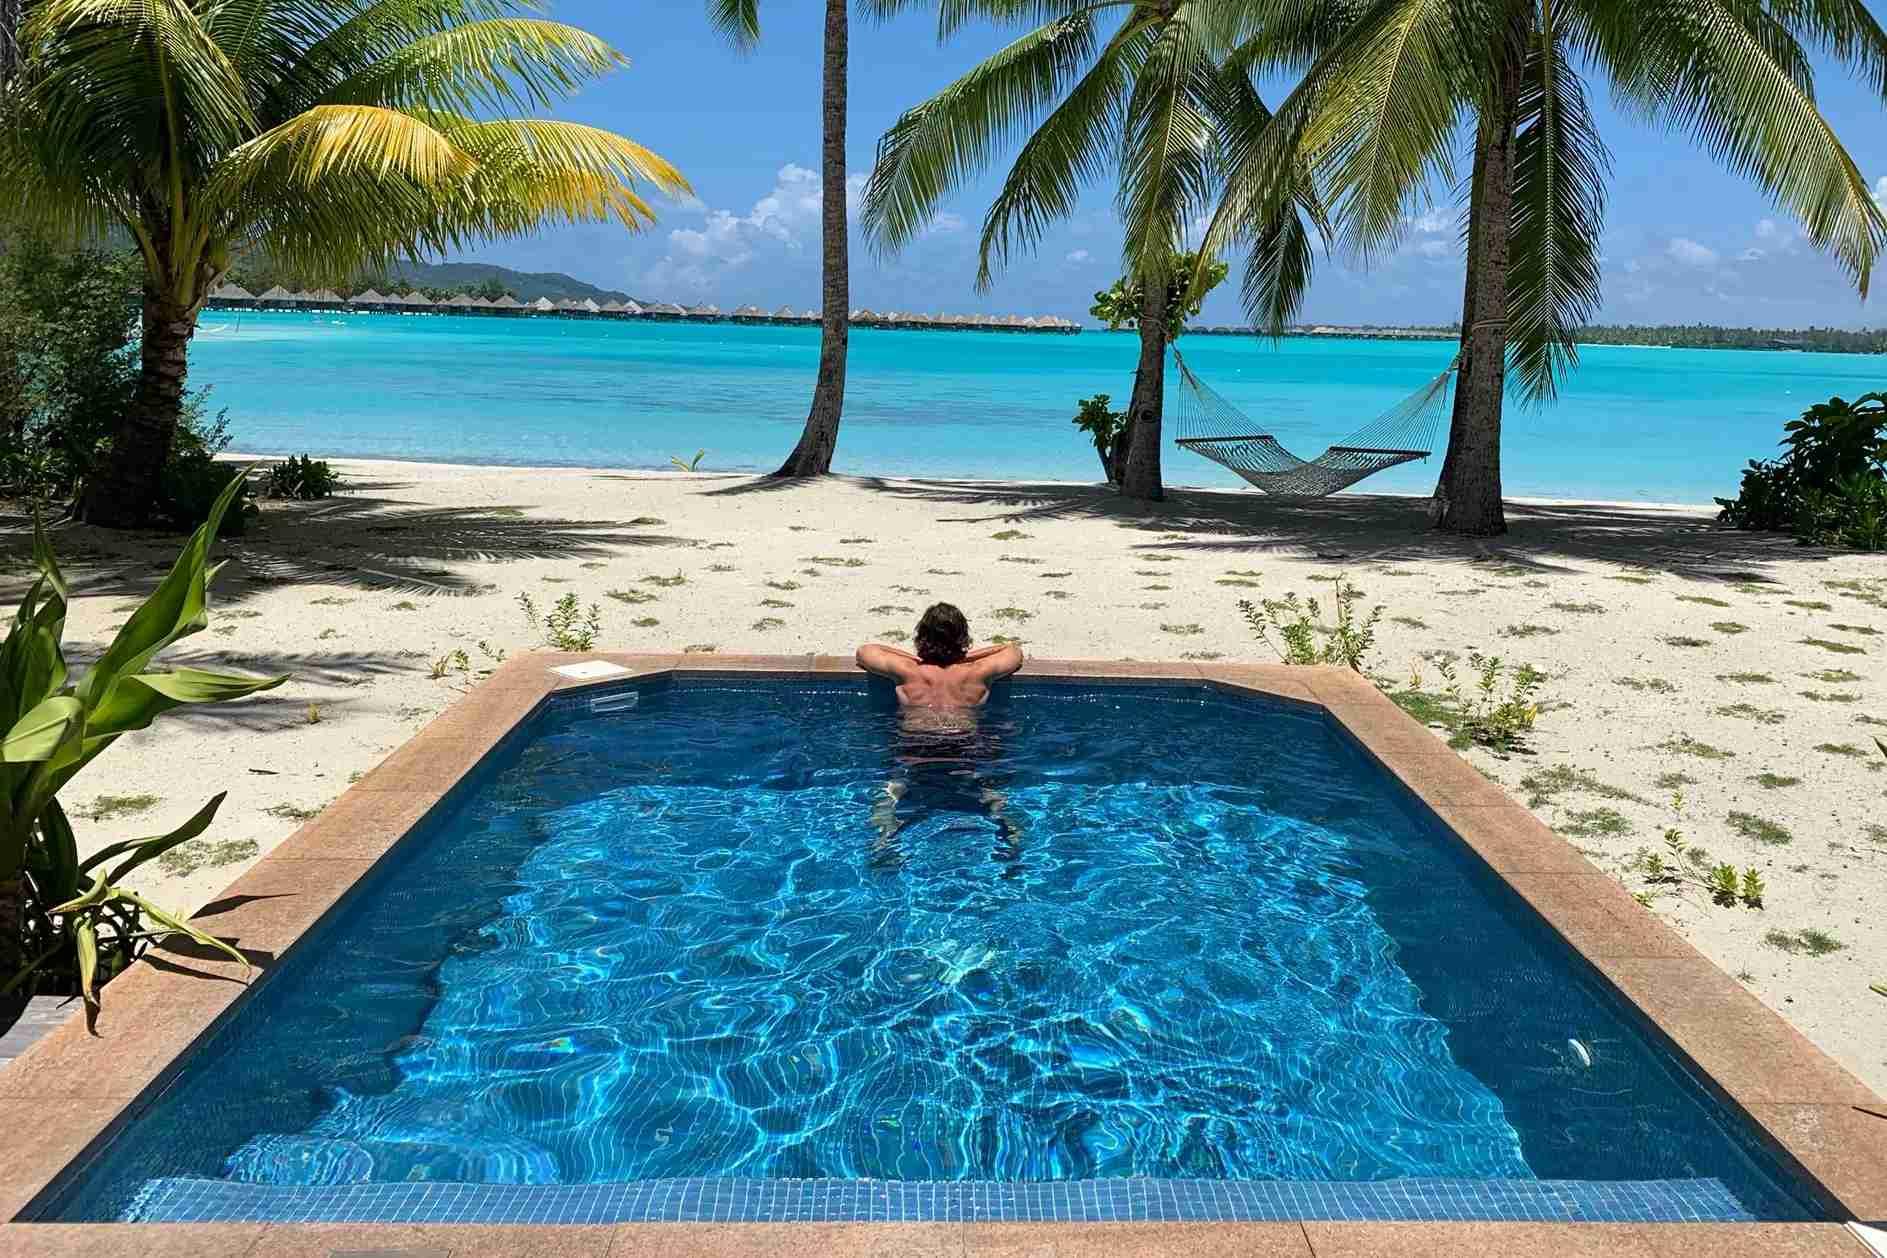 My Marriott Platinum status got me an upgrade to a lagoon front beach villa.